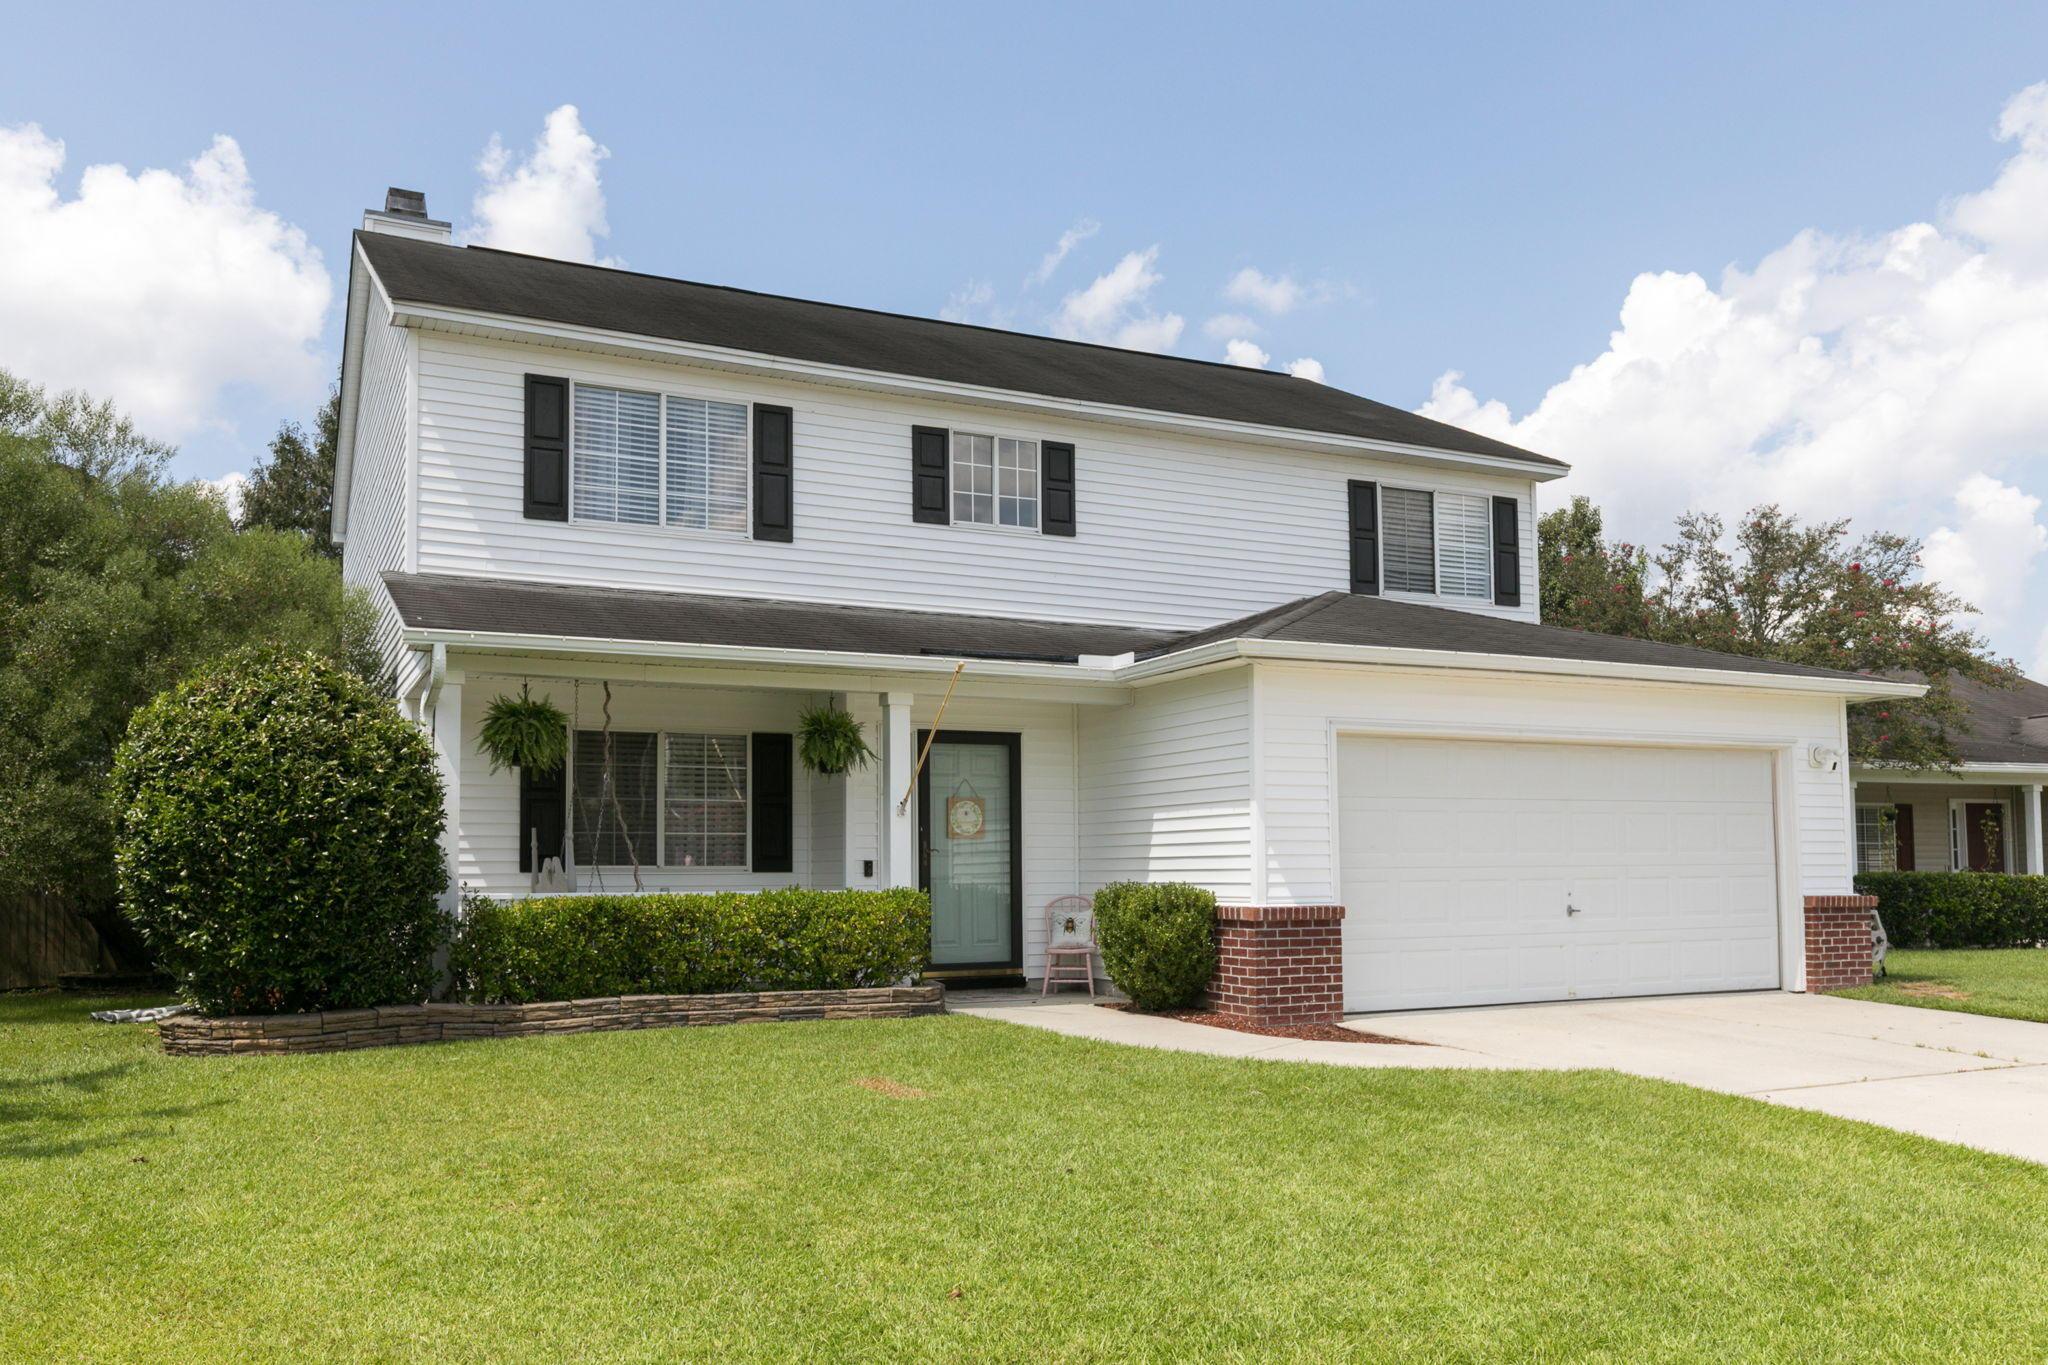 Bridges of Summerville Homes For Sale - 25 Regency Oaks, Summerville, SC - 34